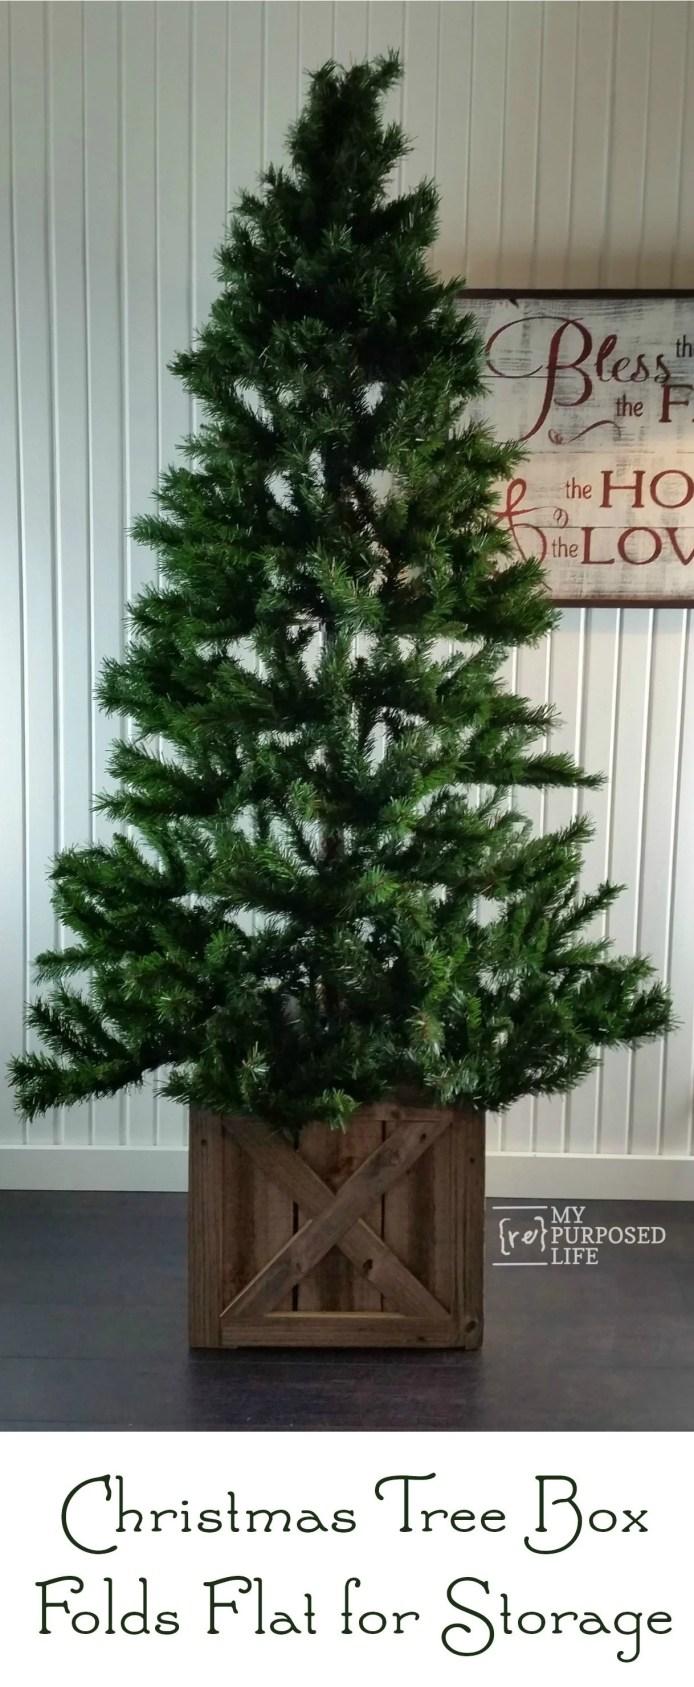 Christmas Tree Stand Box folds flat for storage MyRepurposedLife.com